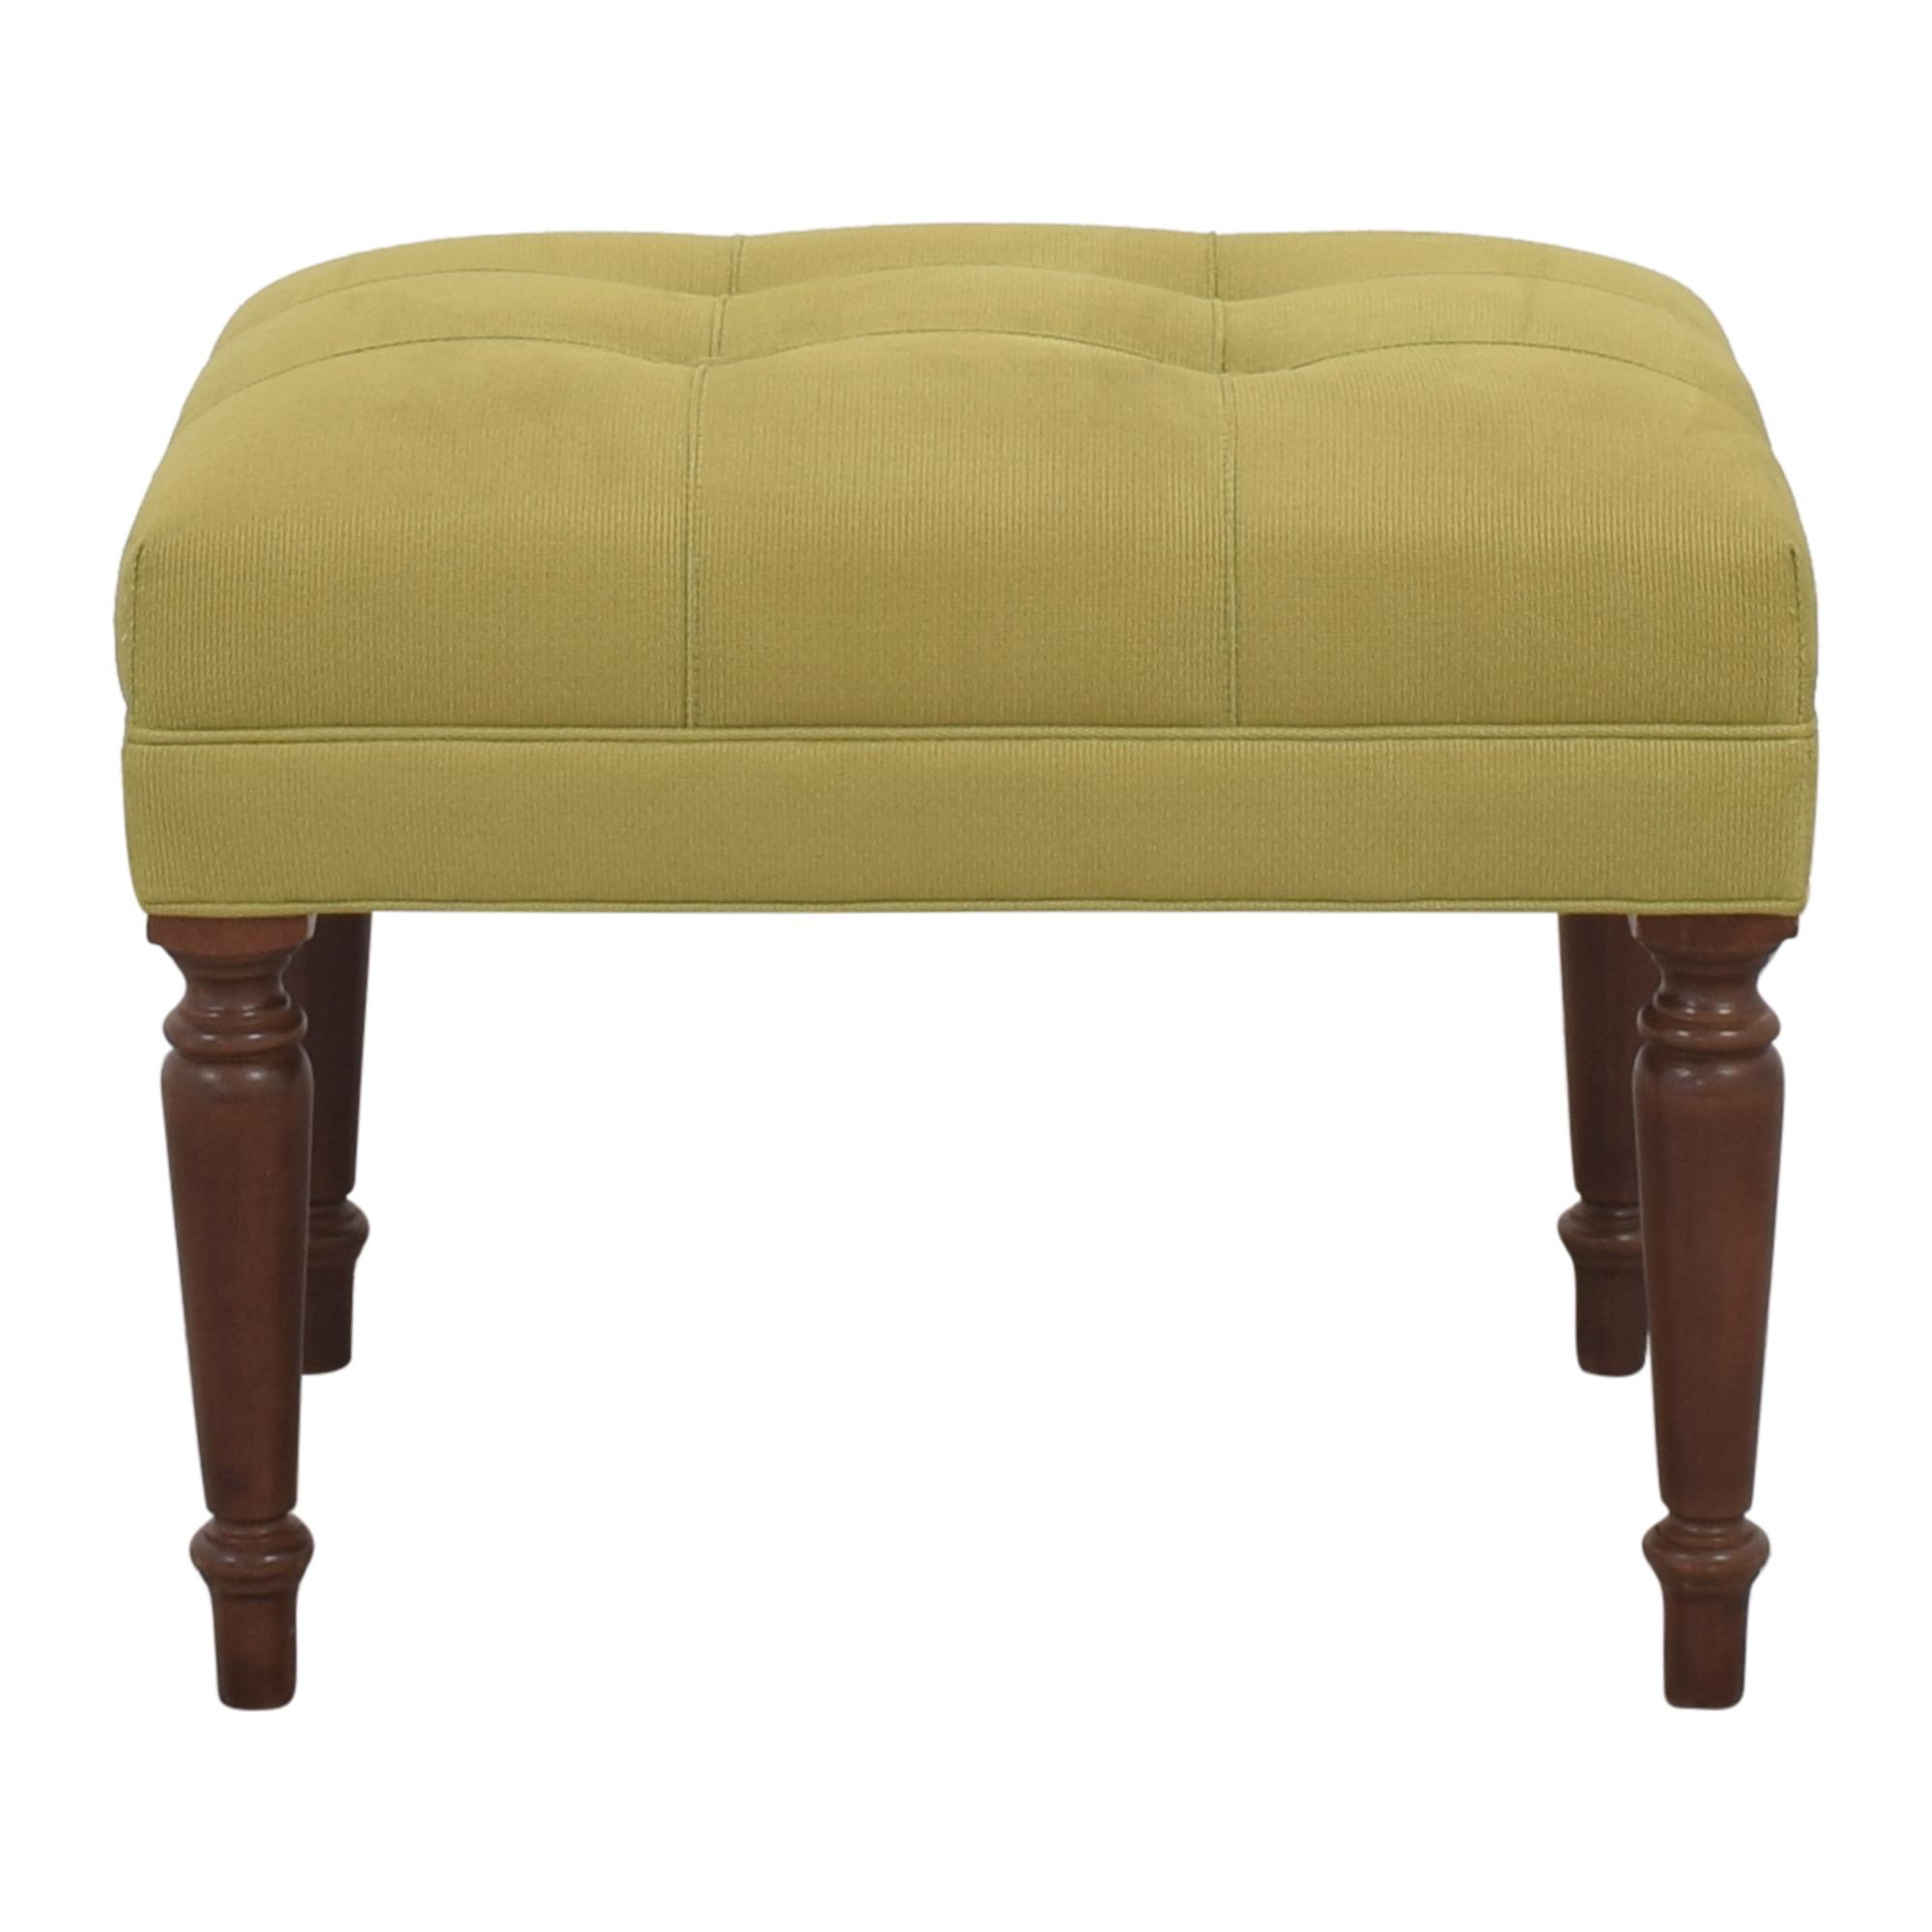 Ethan Allen Ethan Allen Upholstered Ottoman for sale